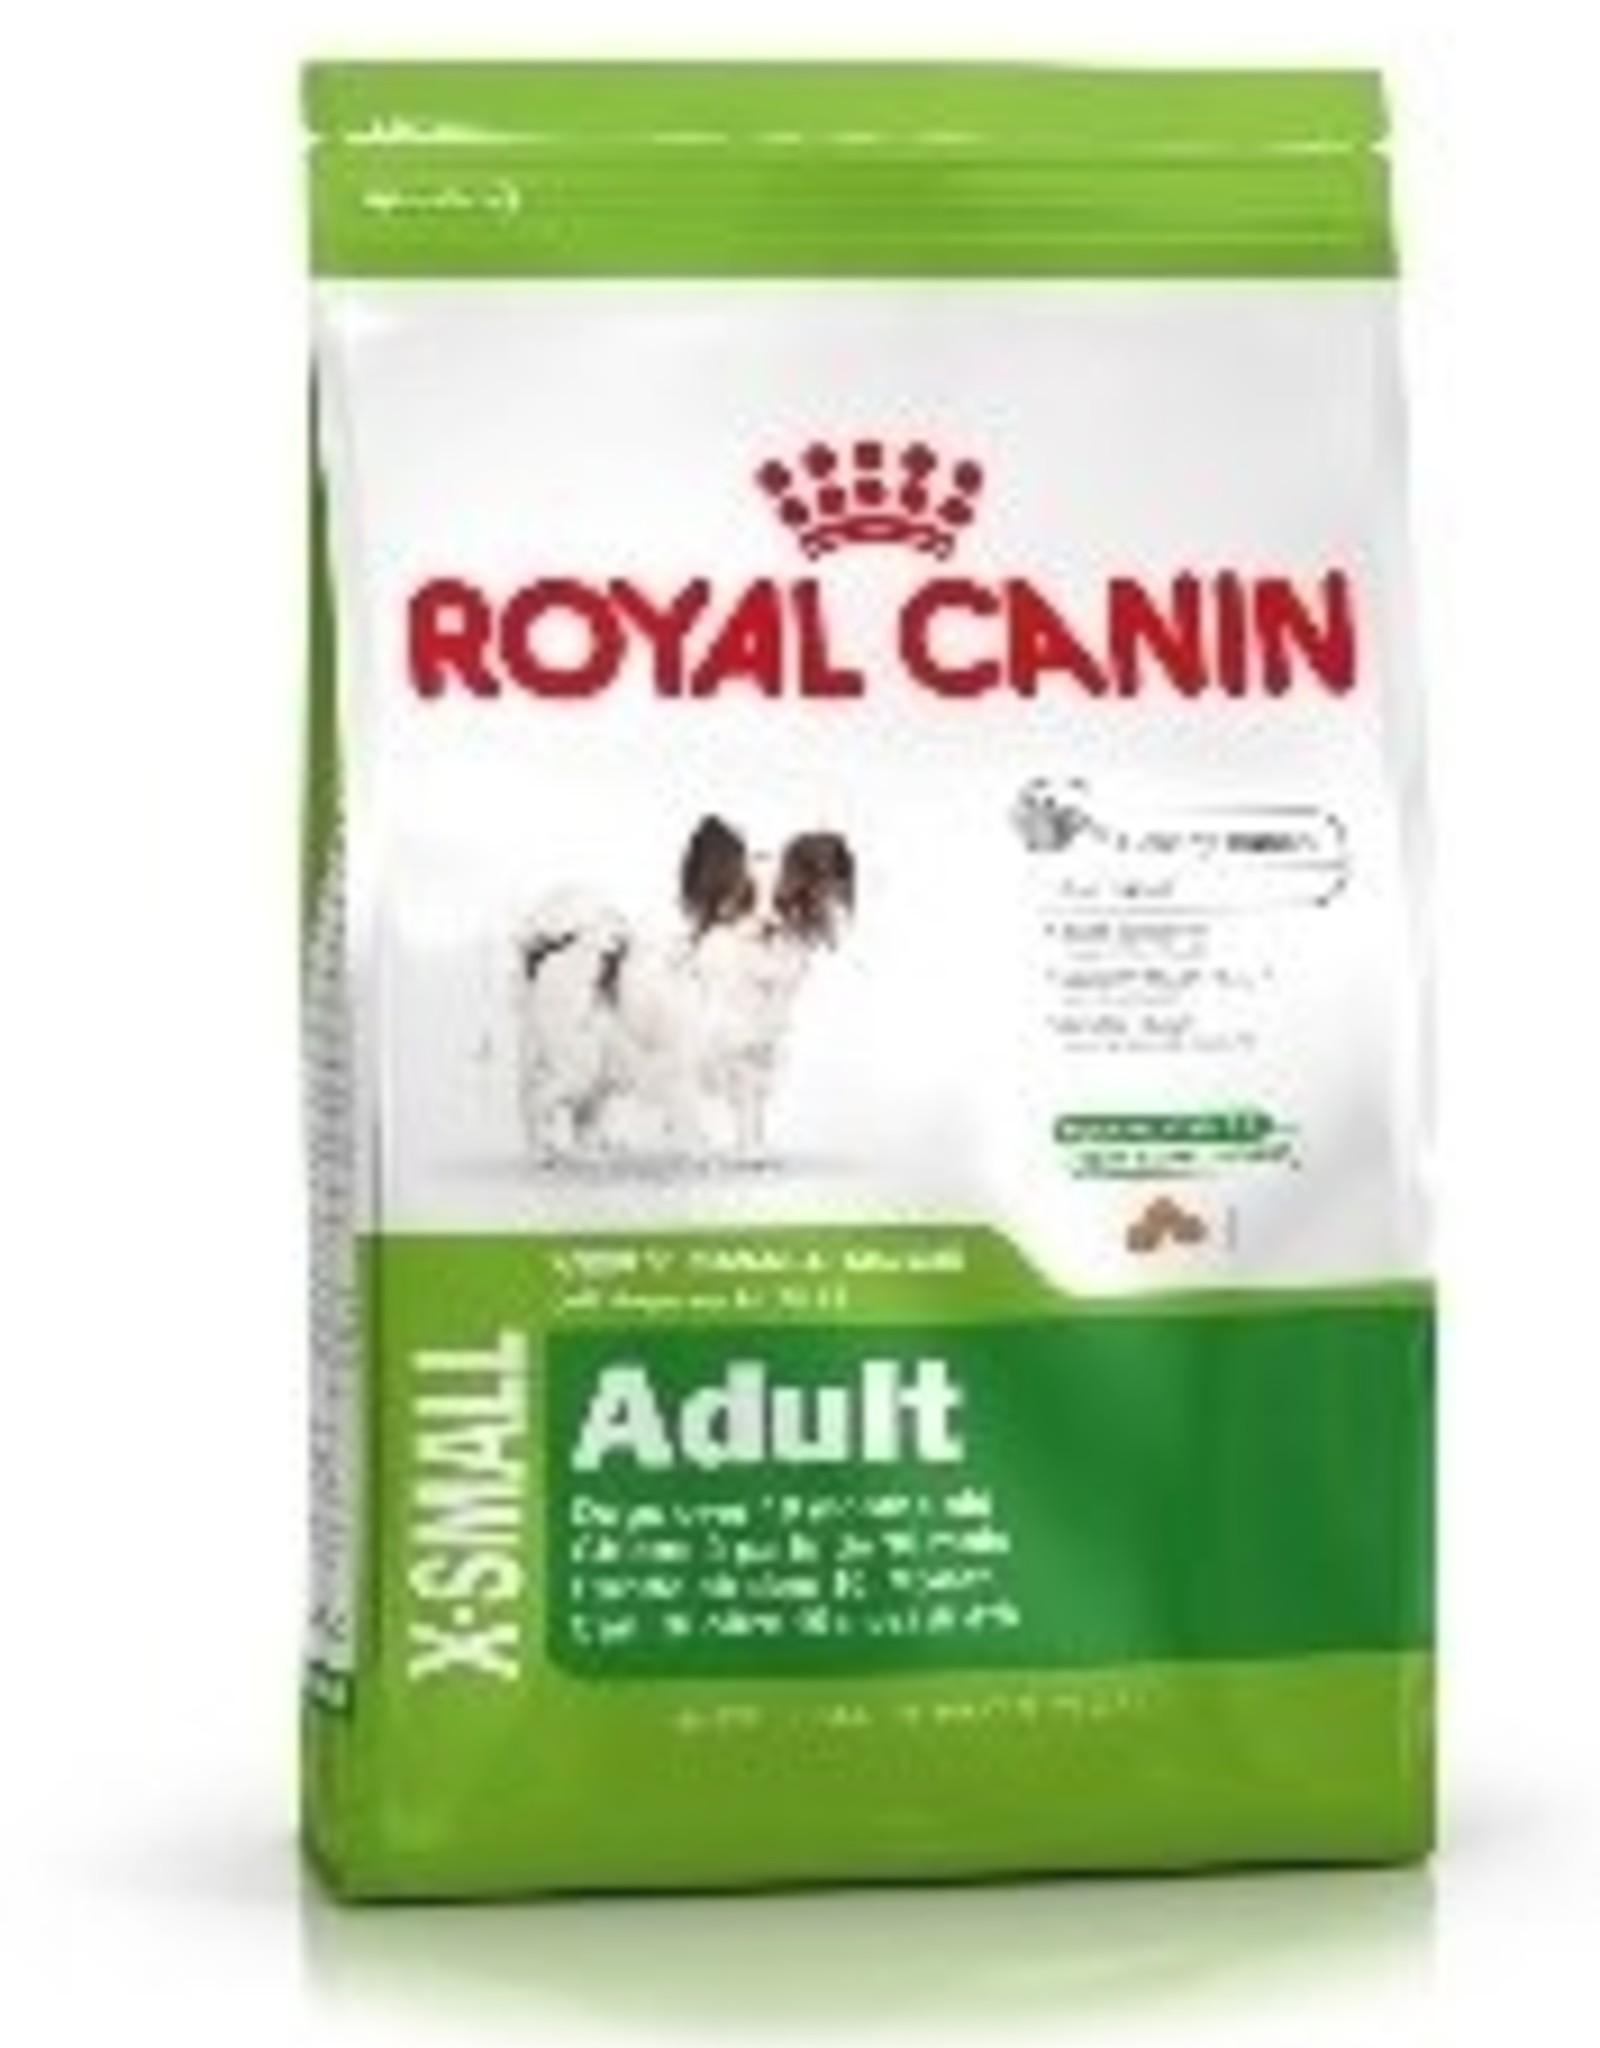 Royal Canin Royal Canin Shn X Small Adult Hond 1,5kg